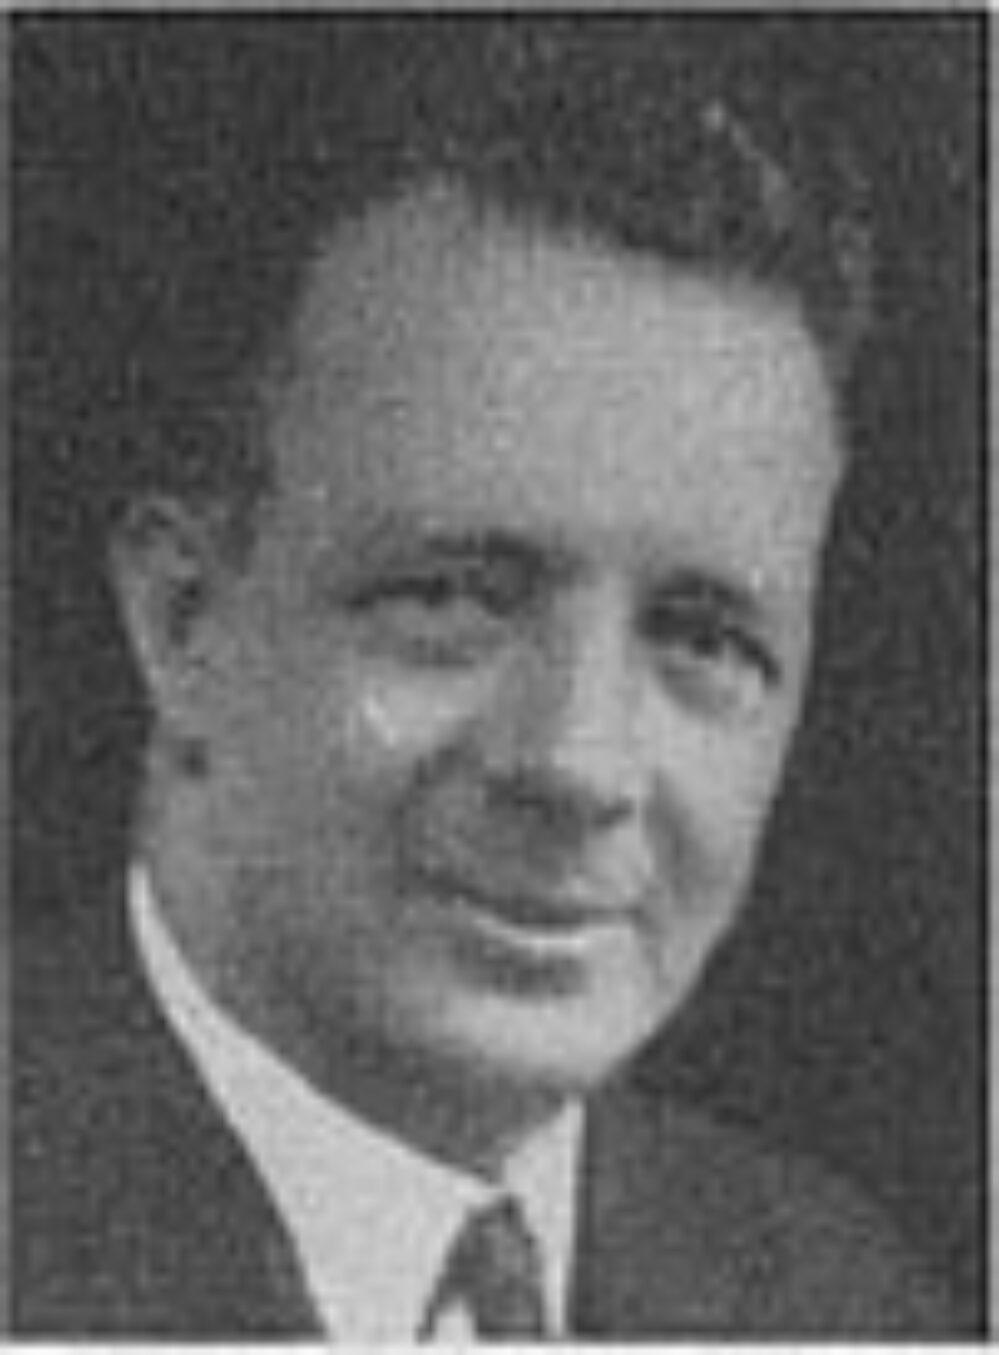 Petter Thoritz Jenssen